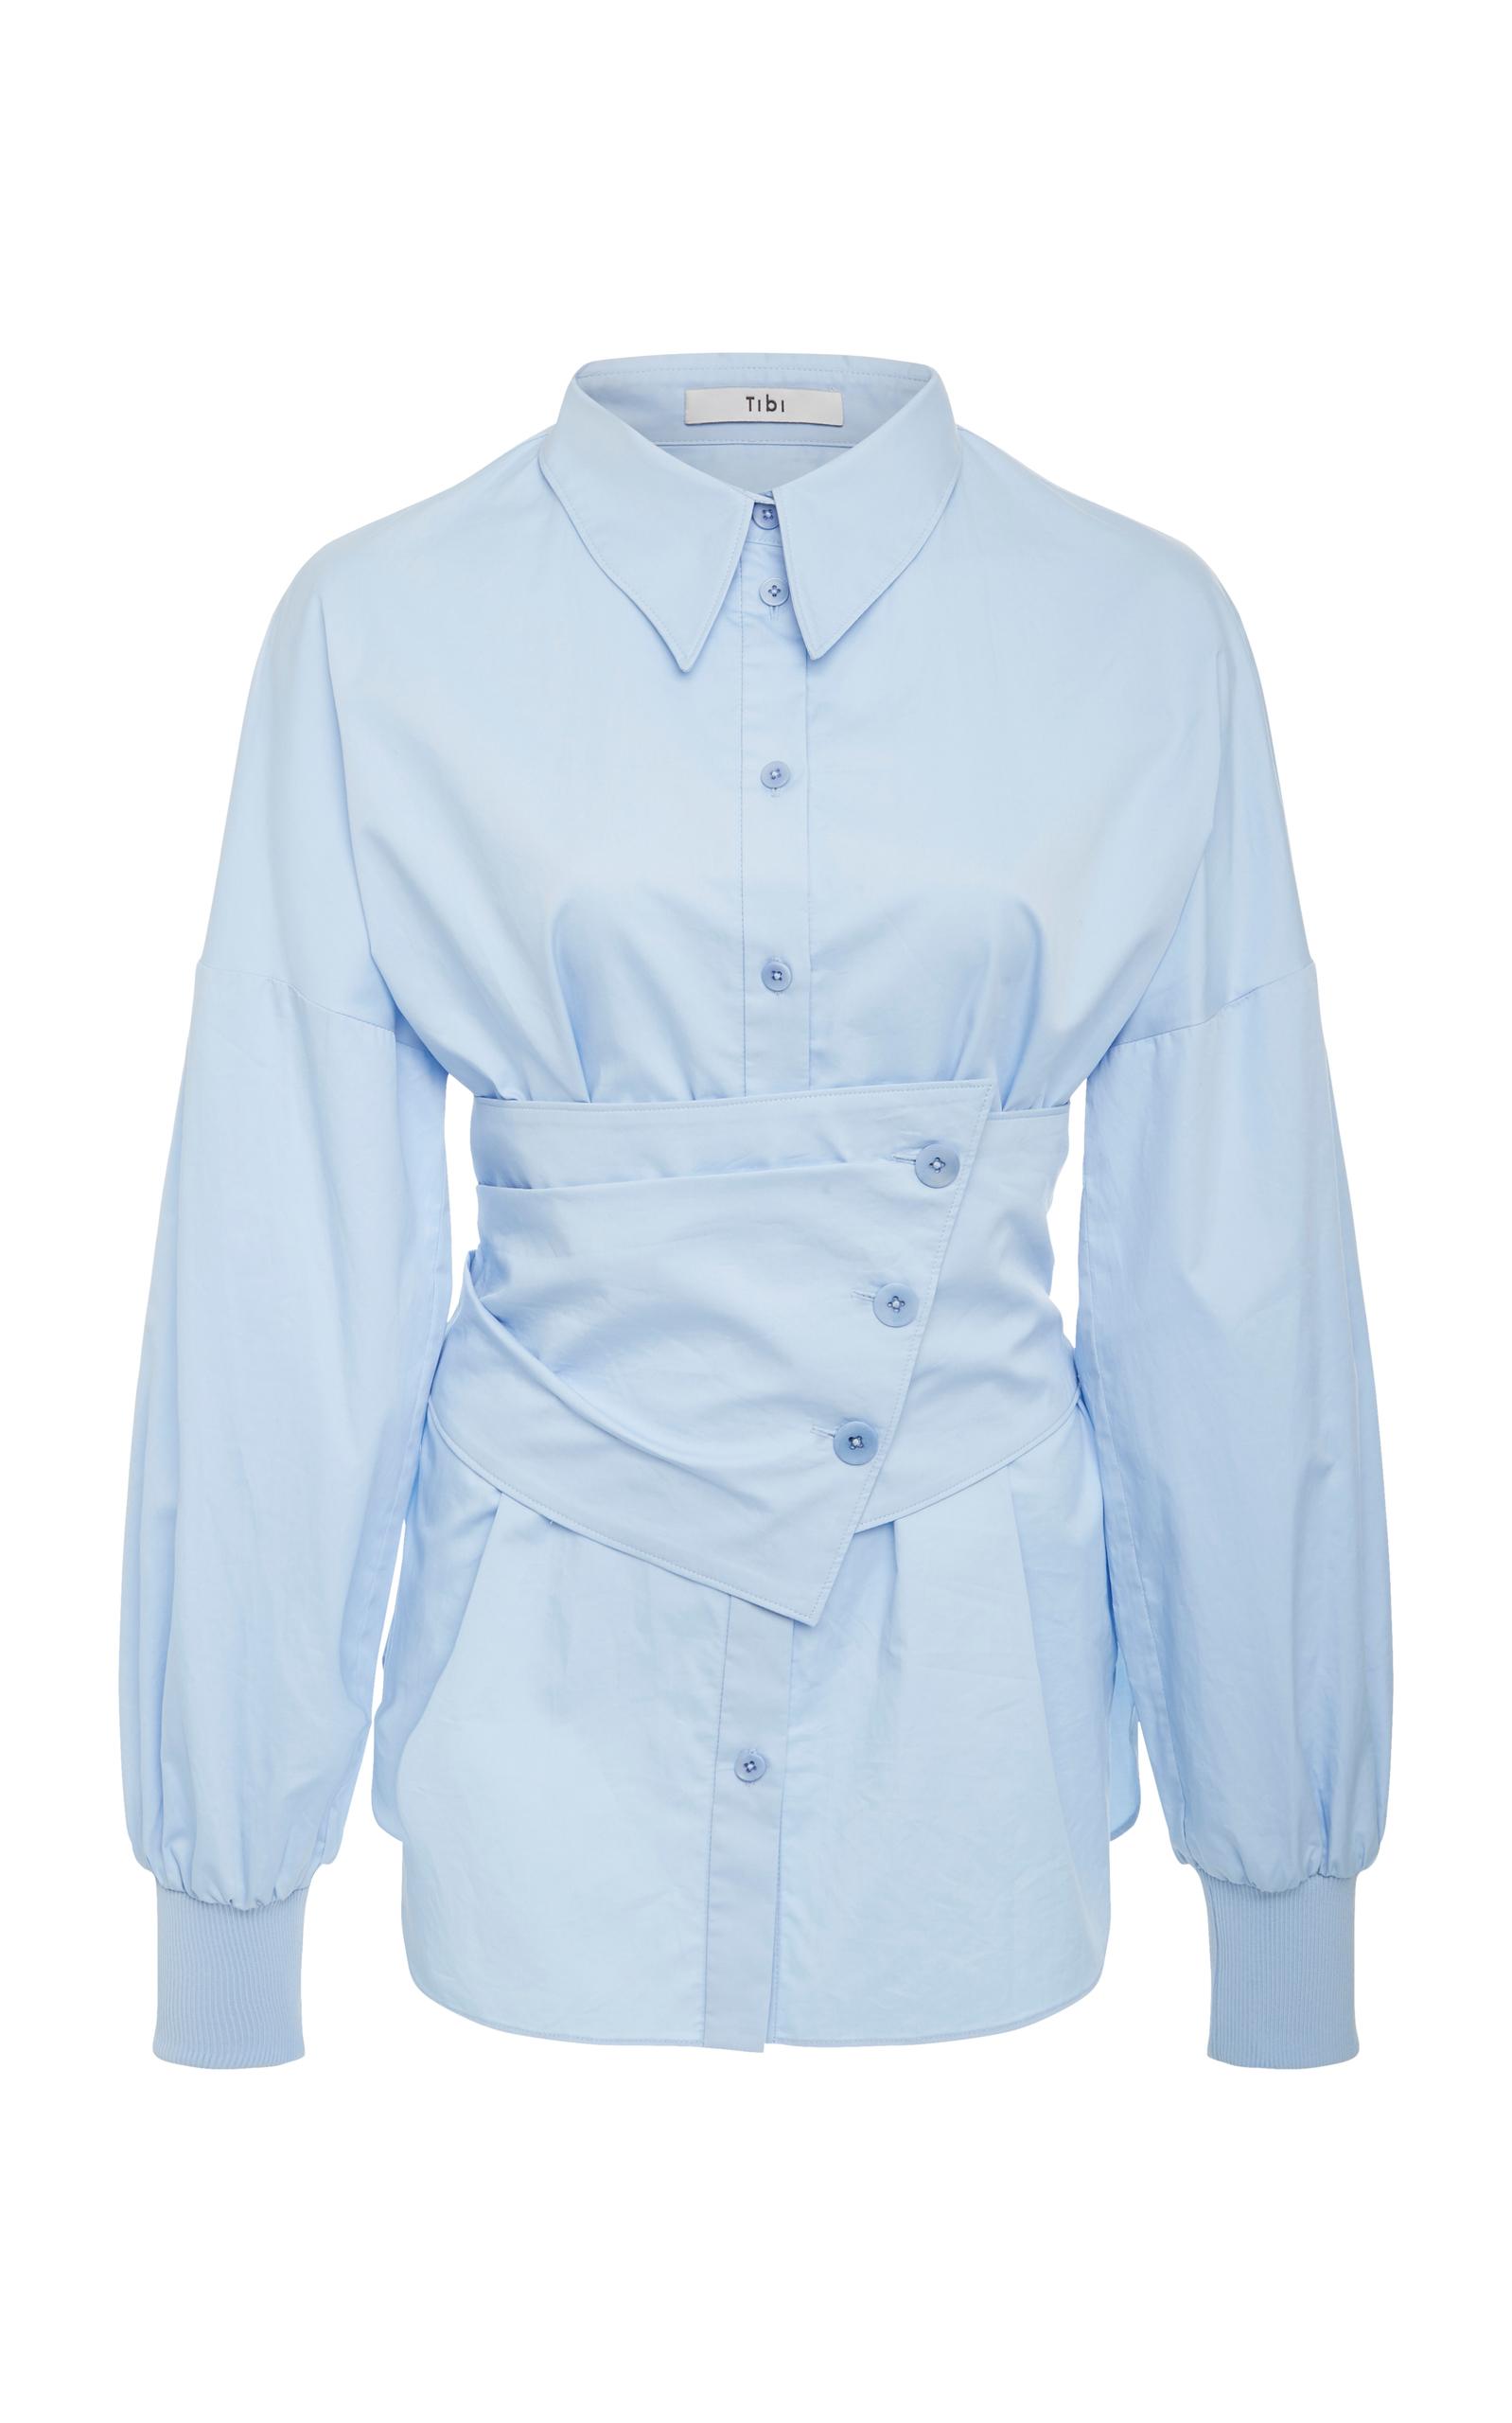 43c61c1af7779 Satin Poplin Detachable Corset Shirt by Tibi